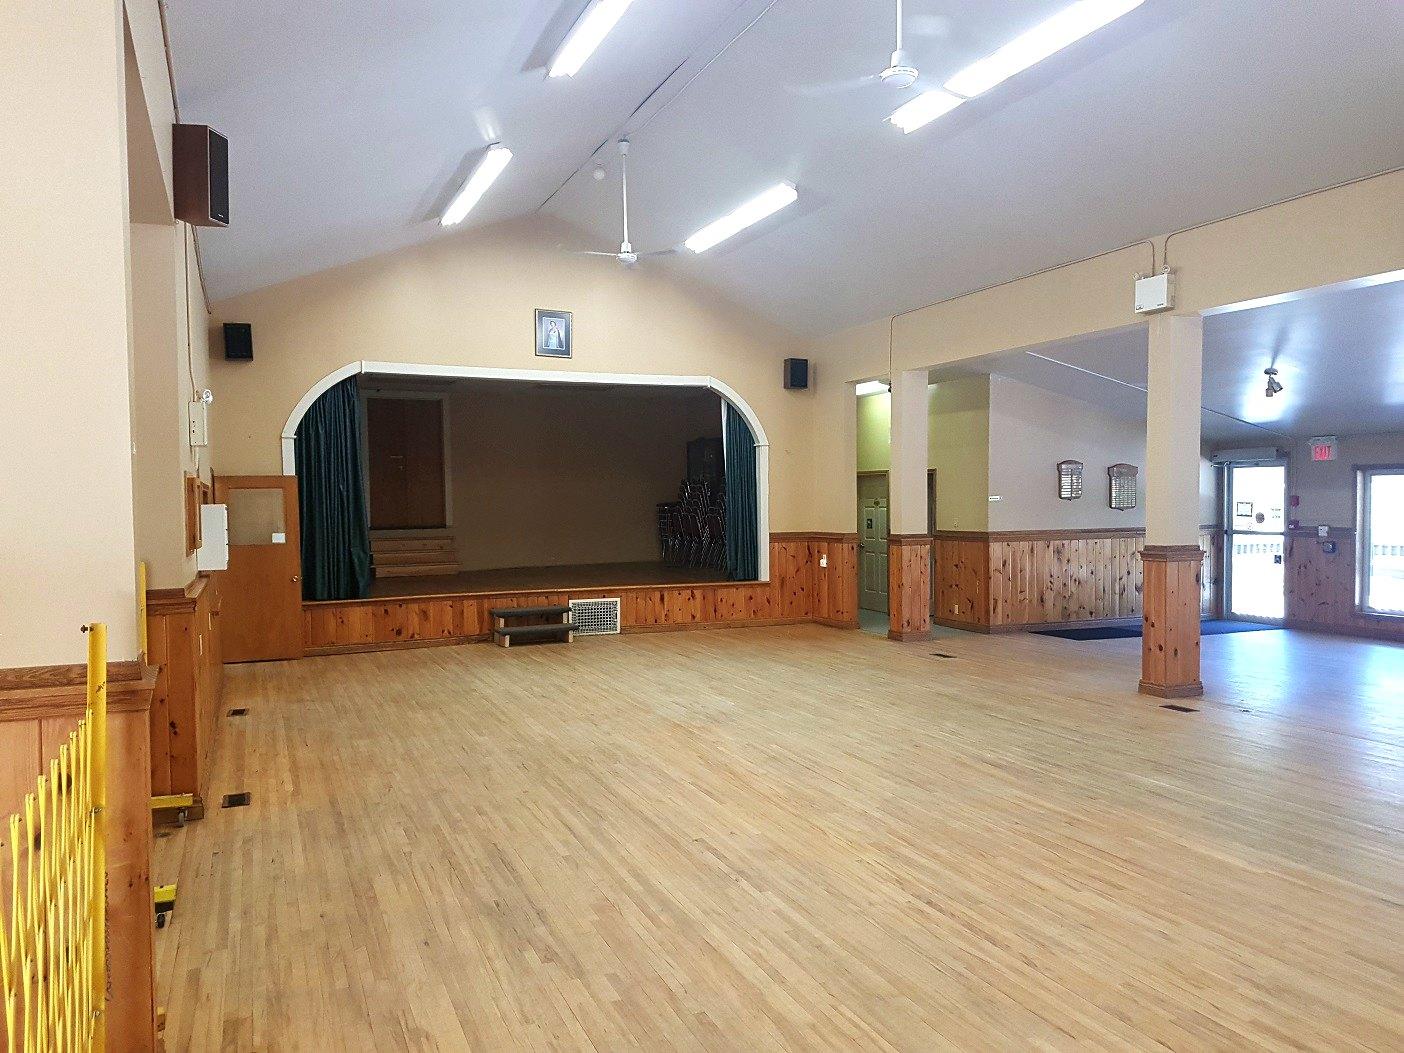 Utterson Hall interior